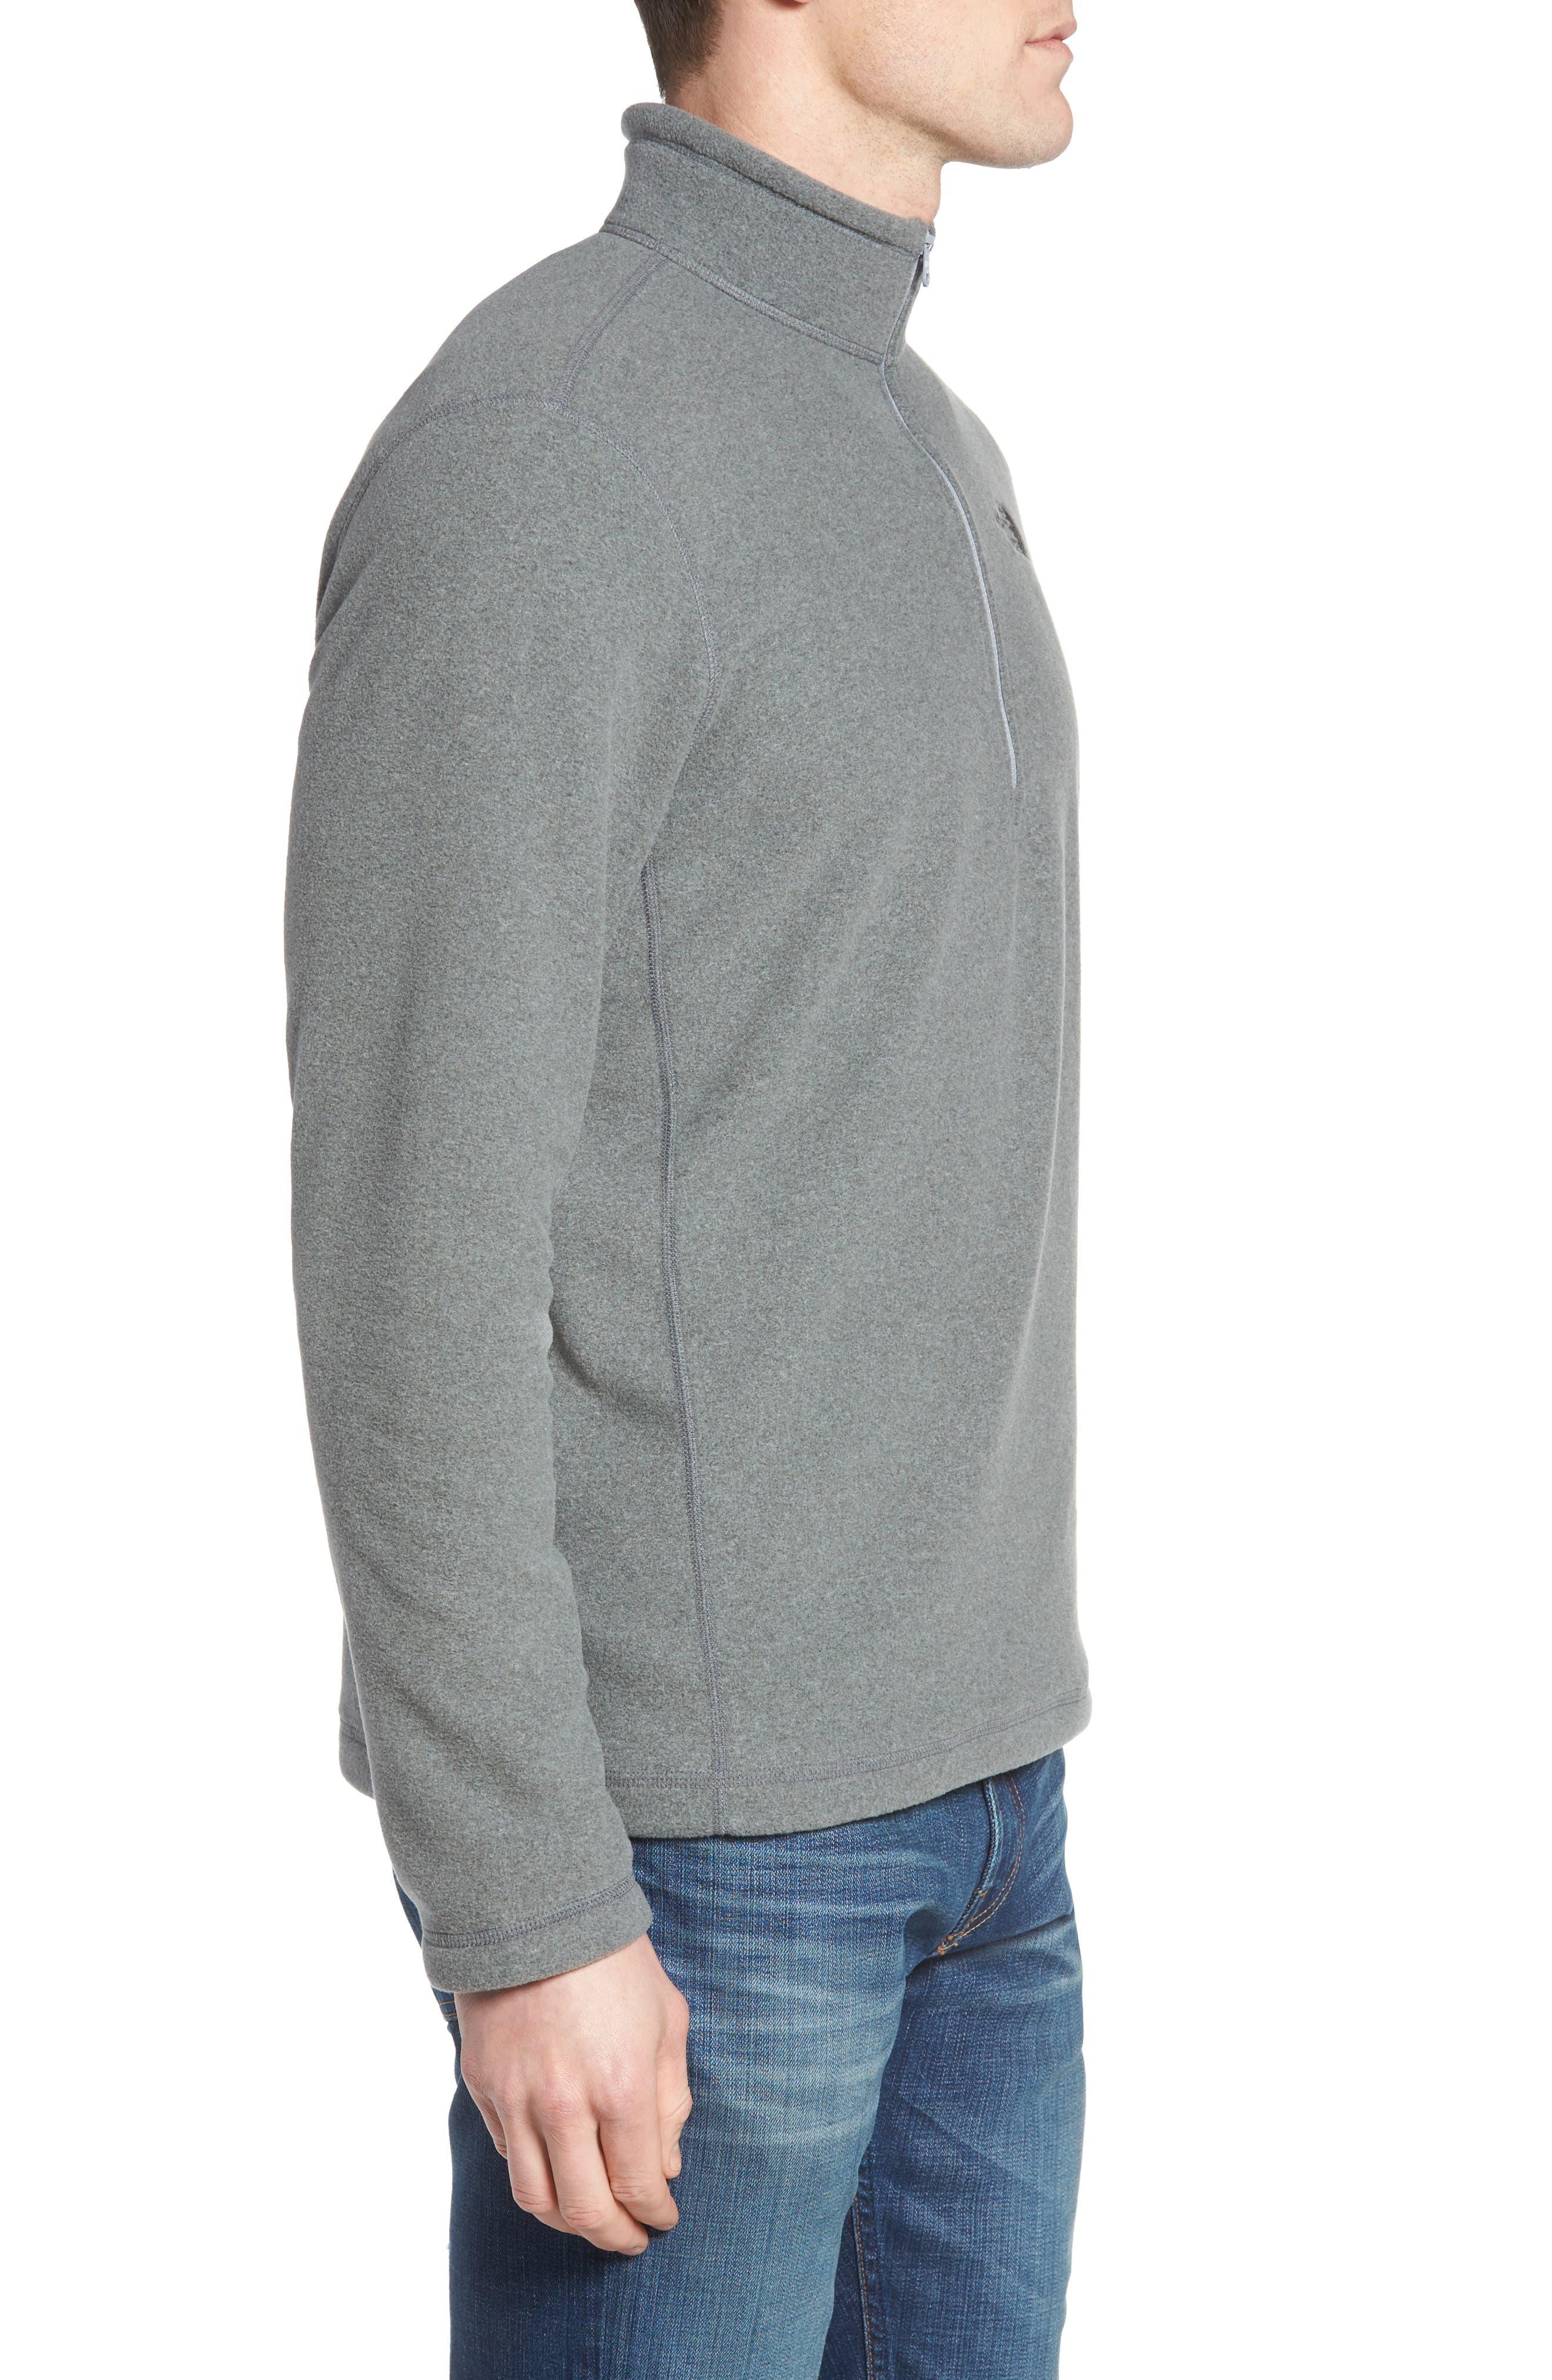 'TKA 100 Glacier' Quarter Zip Fleece Pullover,                             Alternate thumbnail 3, color,                             Tnf Medium Grey Heather